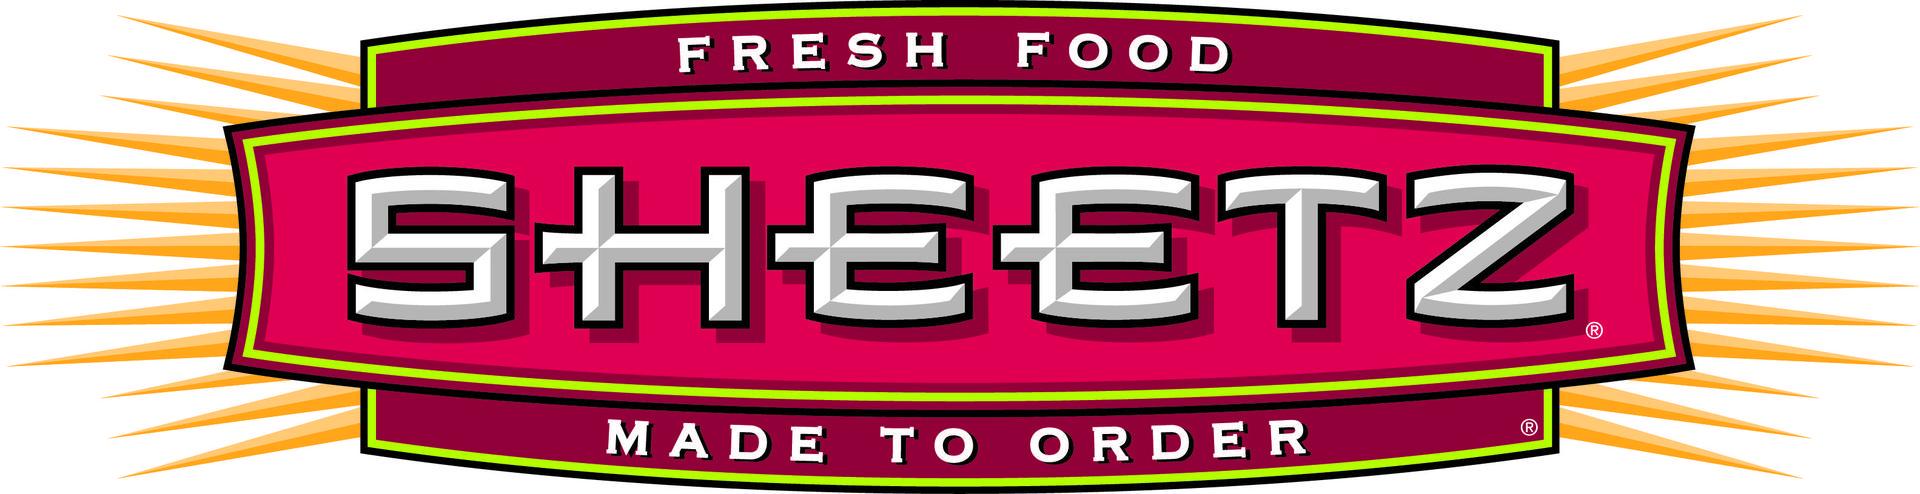 sheetz logo